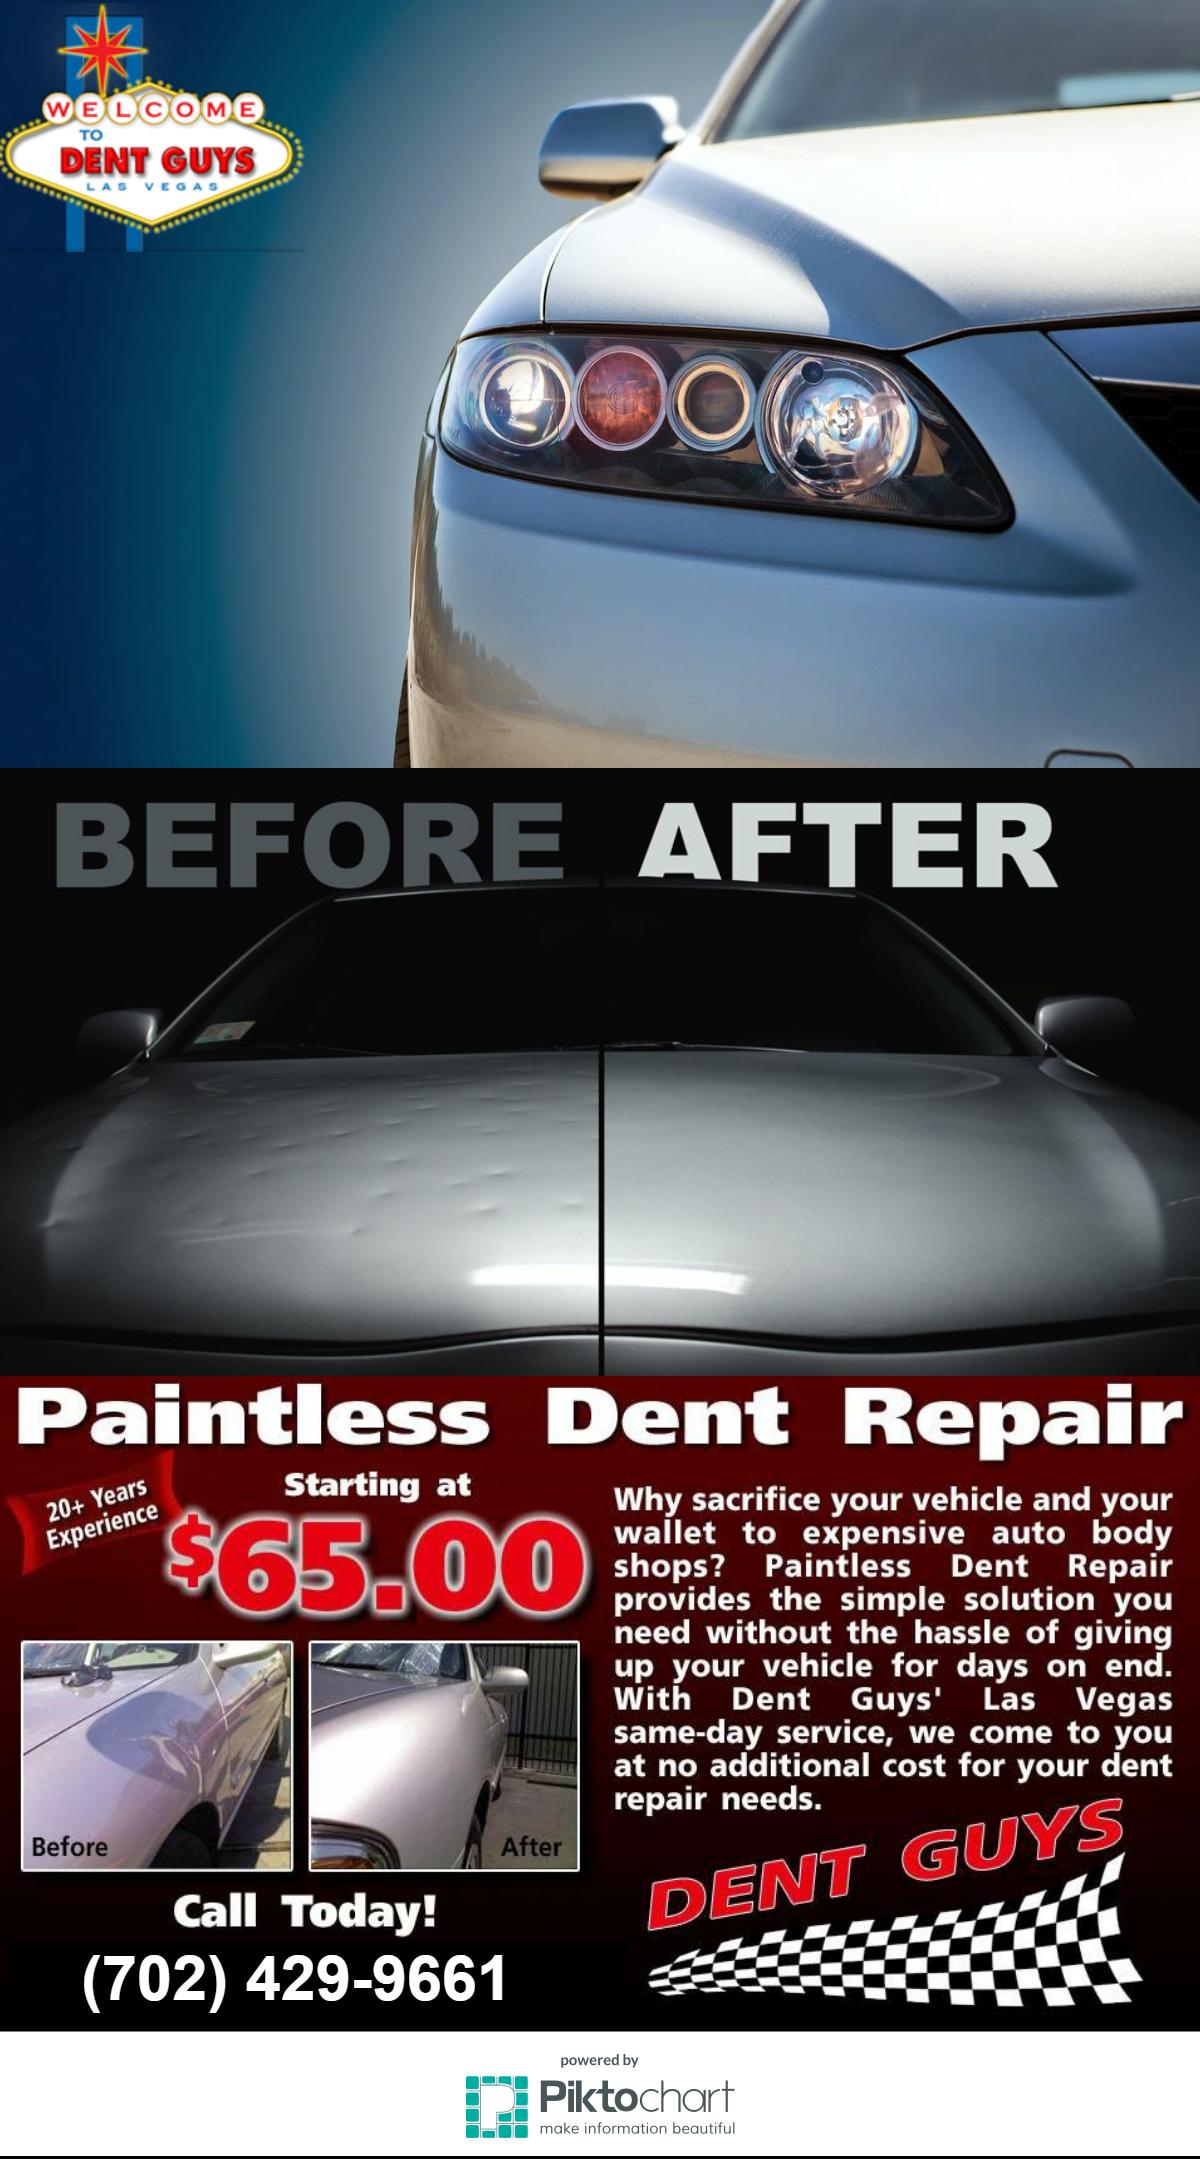 Dent Guys Las Vegas provides paintless dent repair, bumper